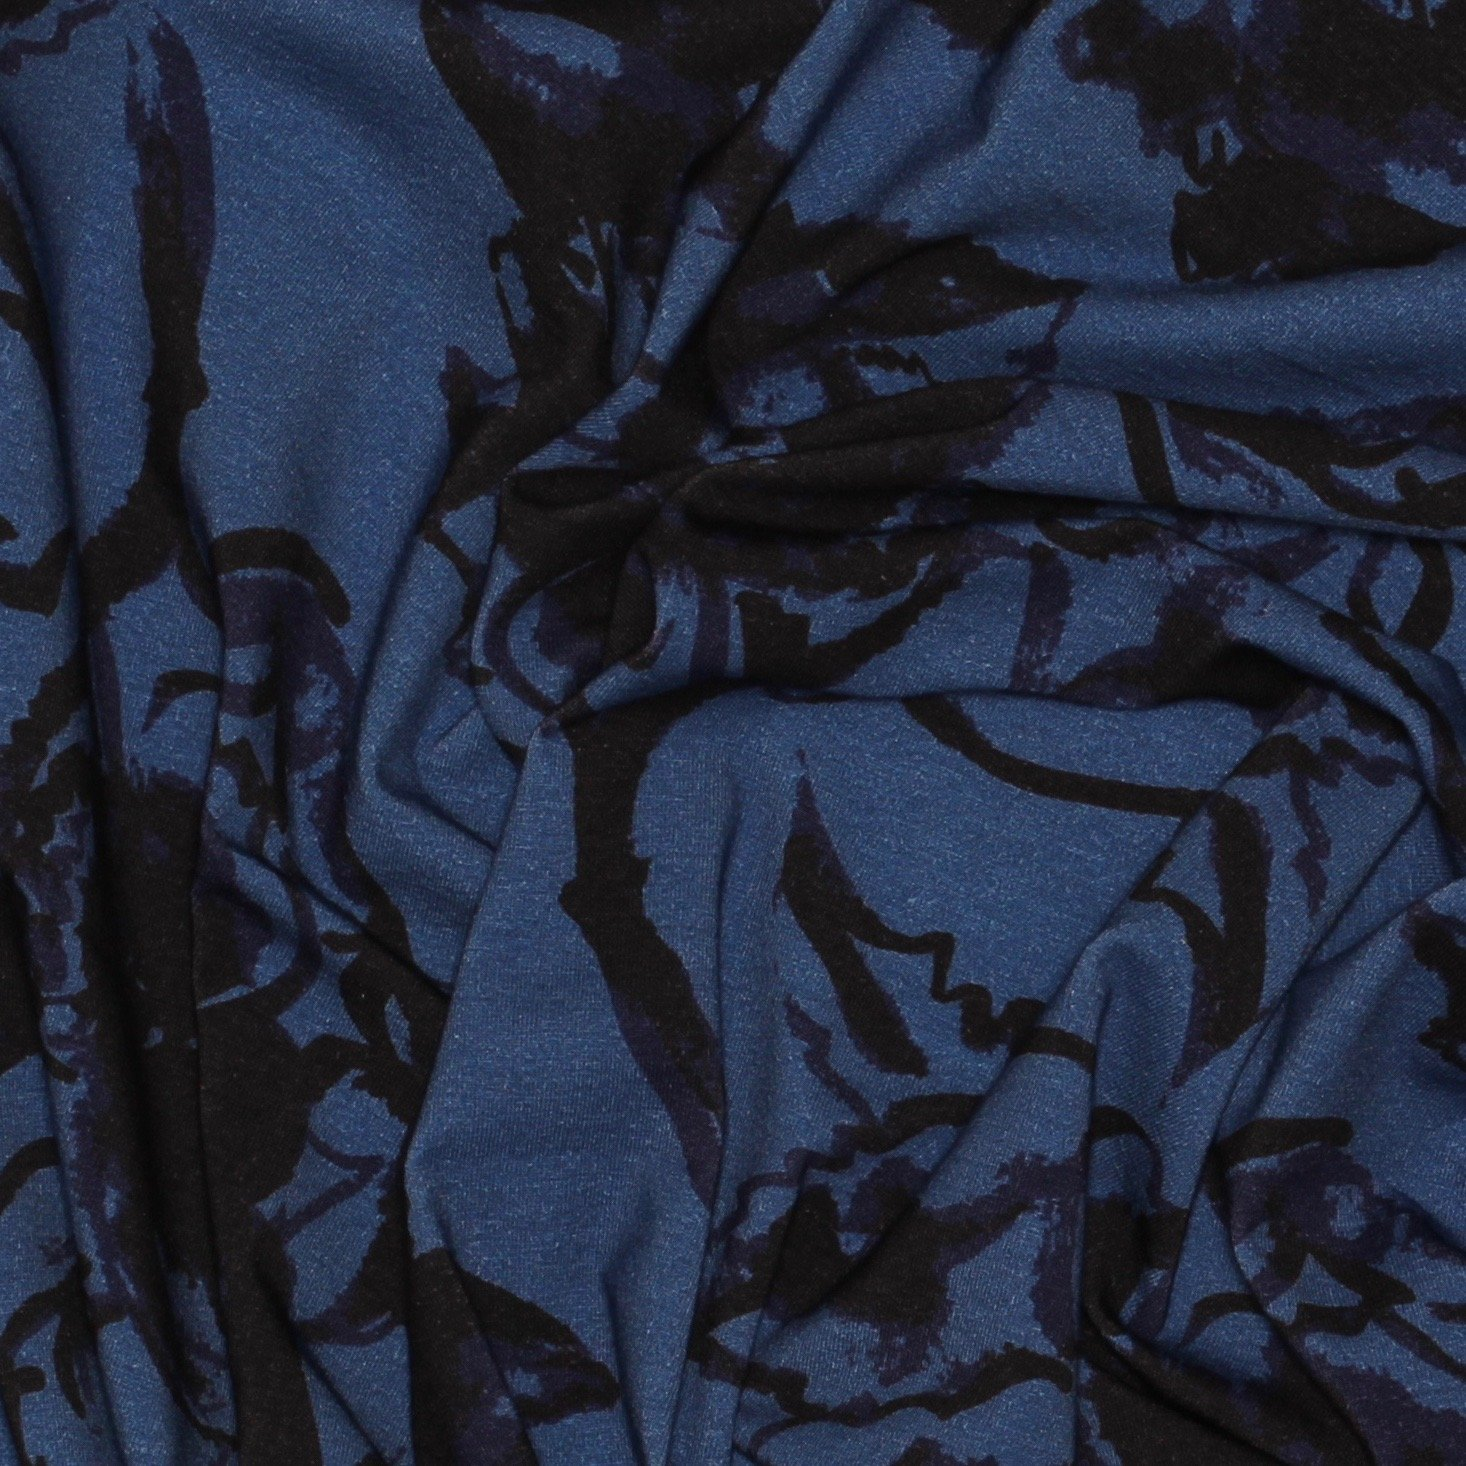 Tammie Green Hibiscus Knit - Coastal Blue - Riley Blake